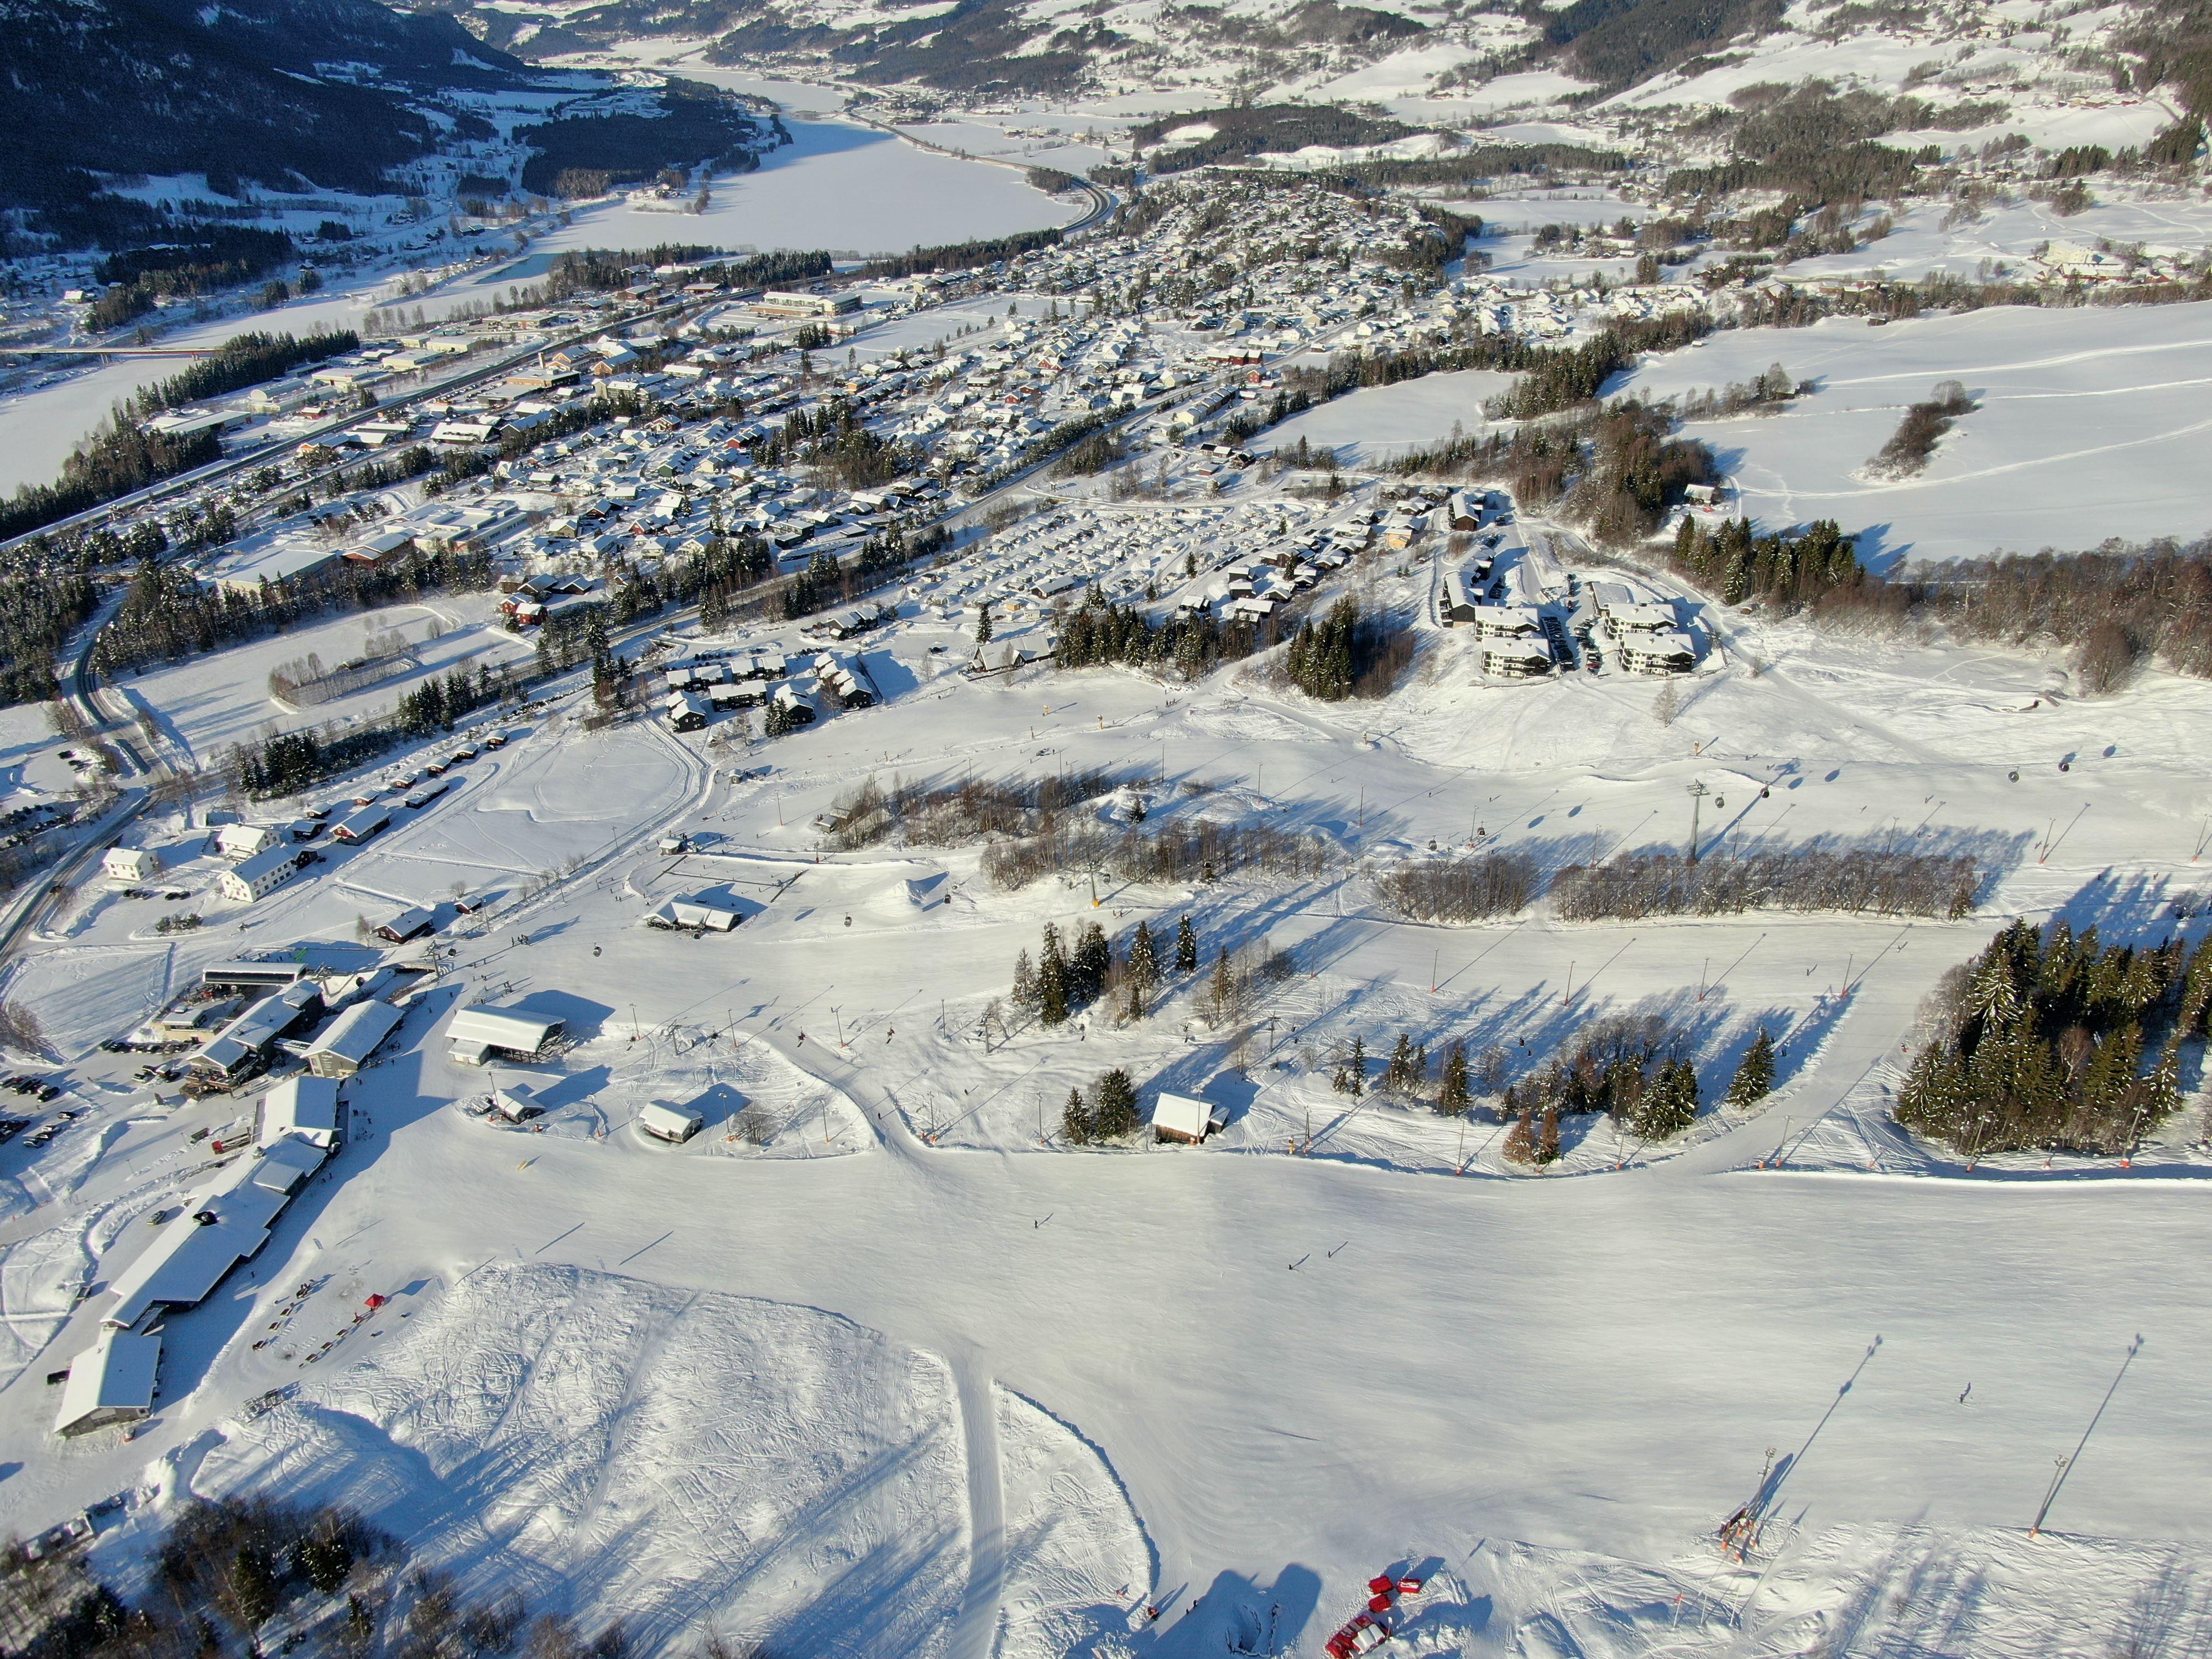 Vinterferie i Hafjell